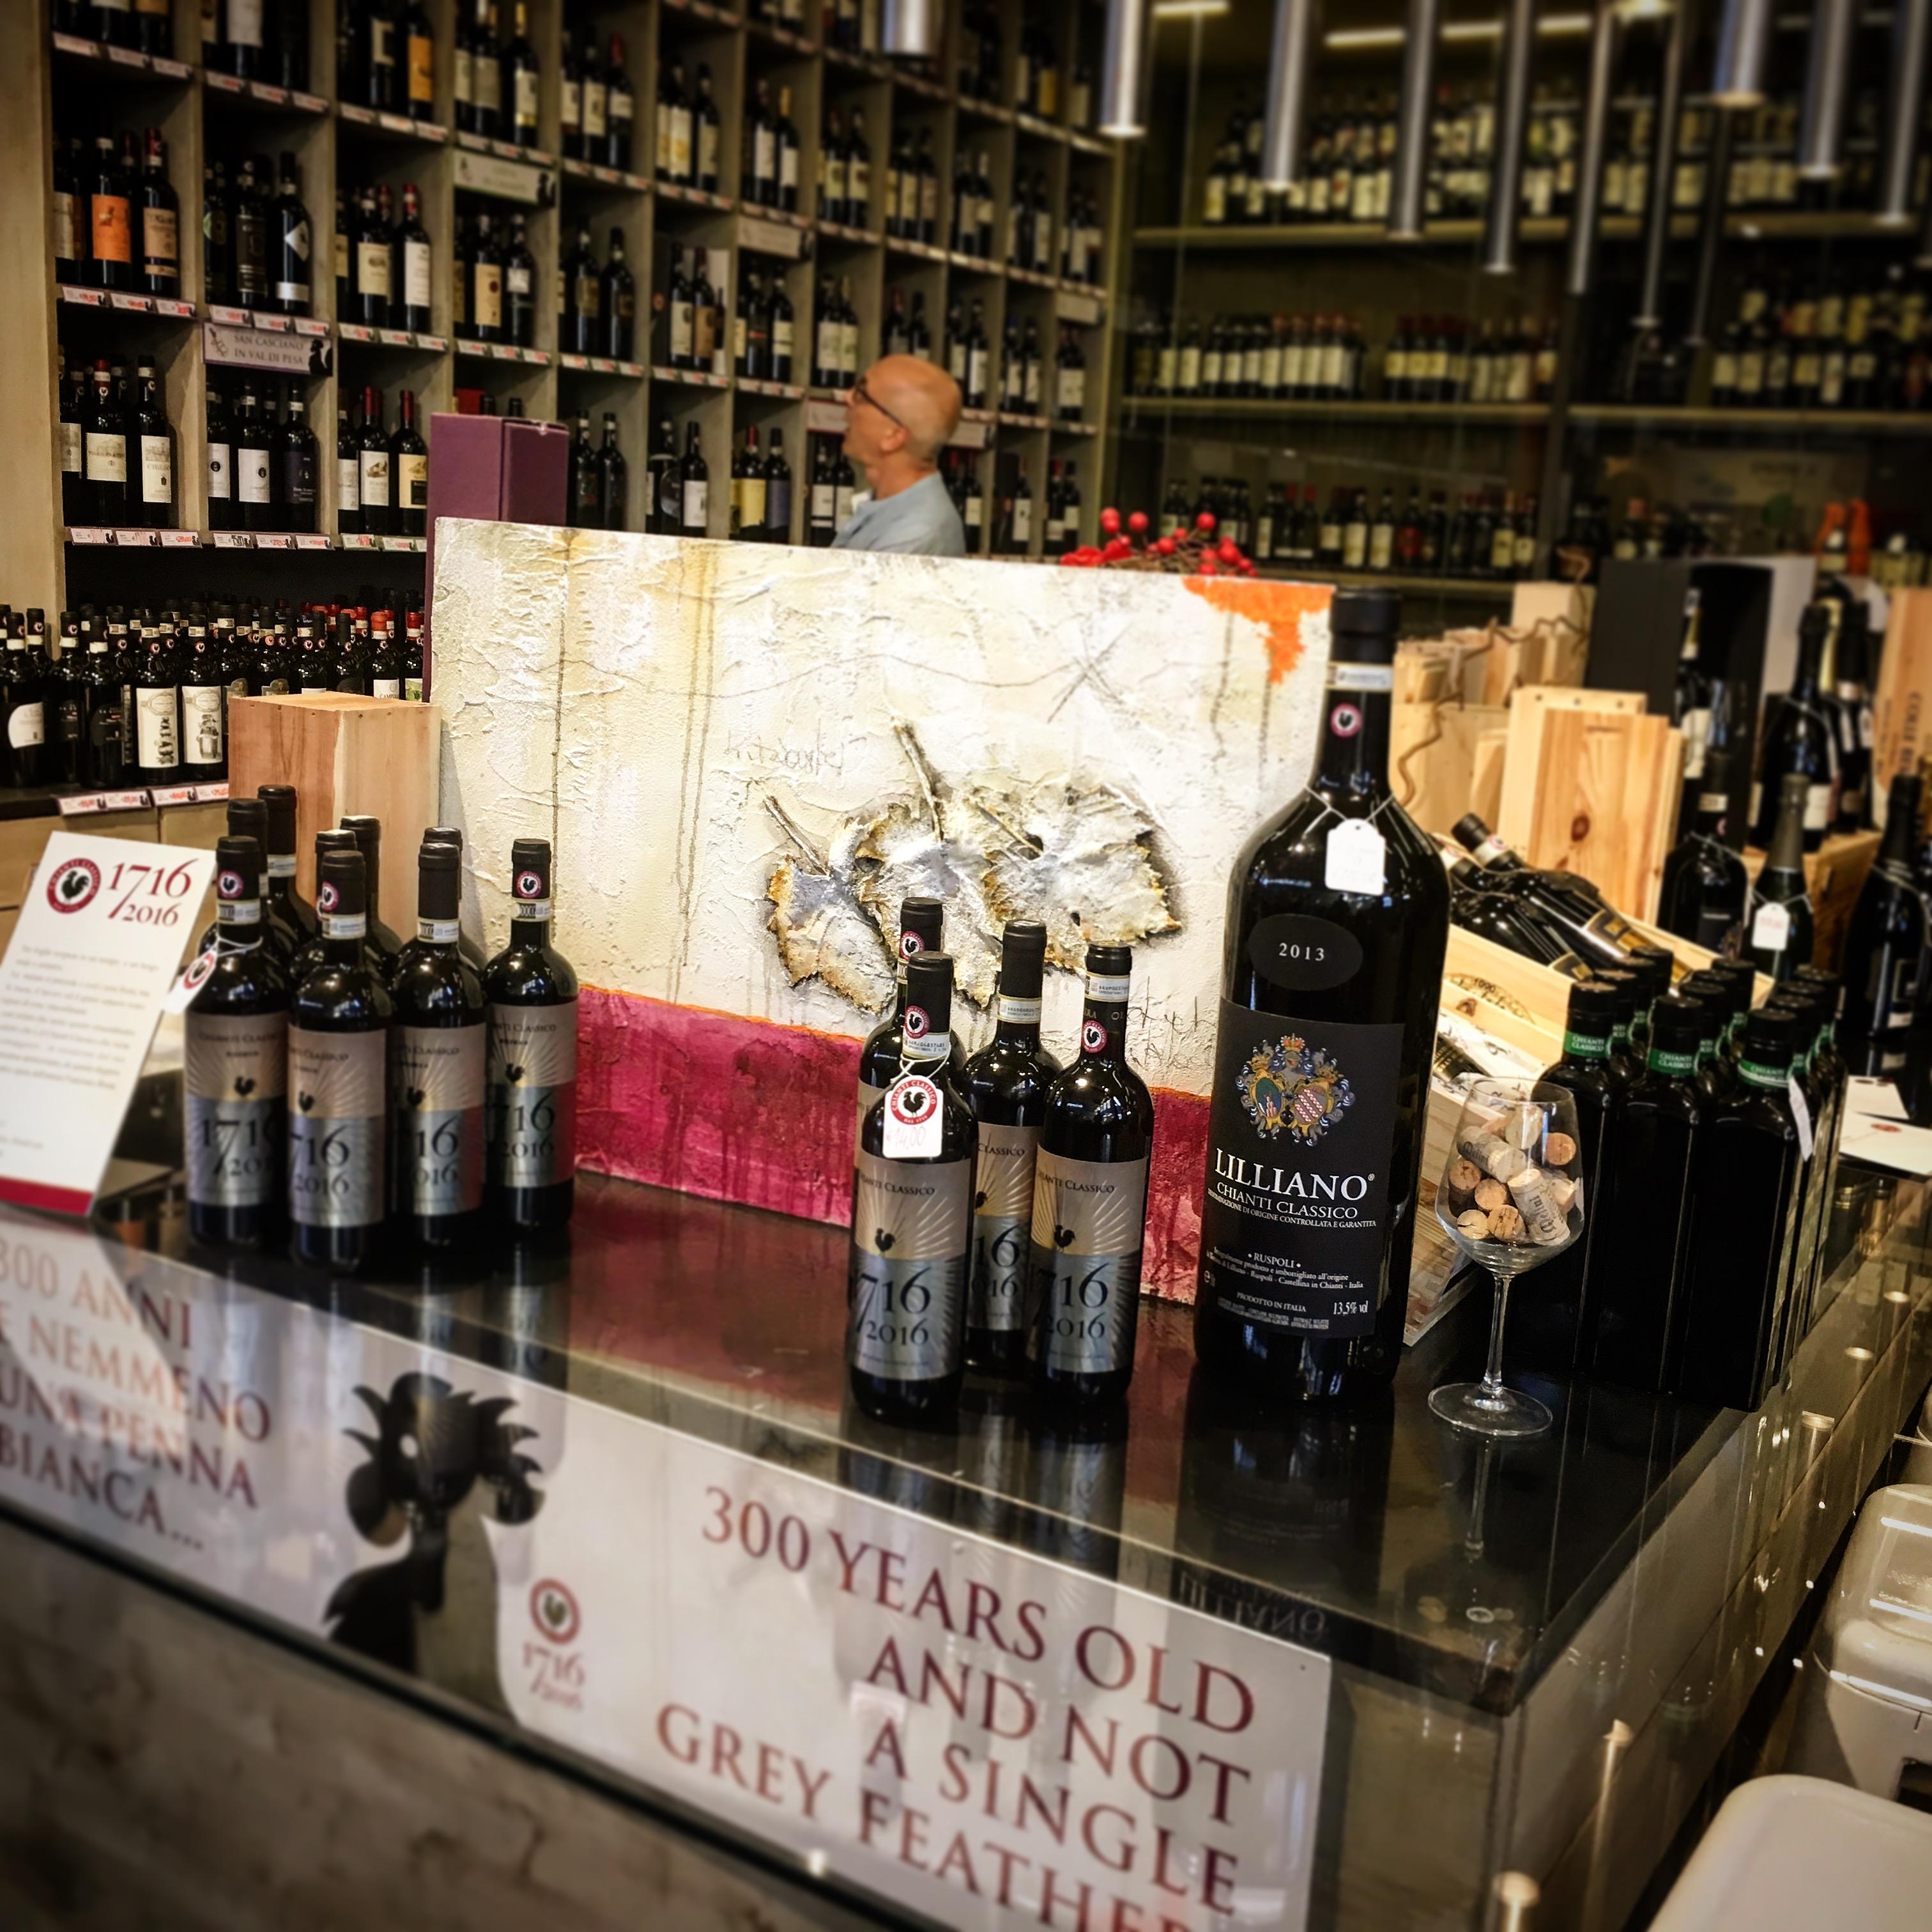 mercato-centrale-firenze-vino